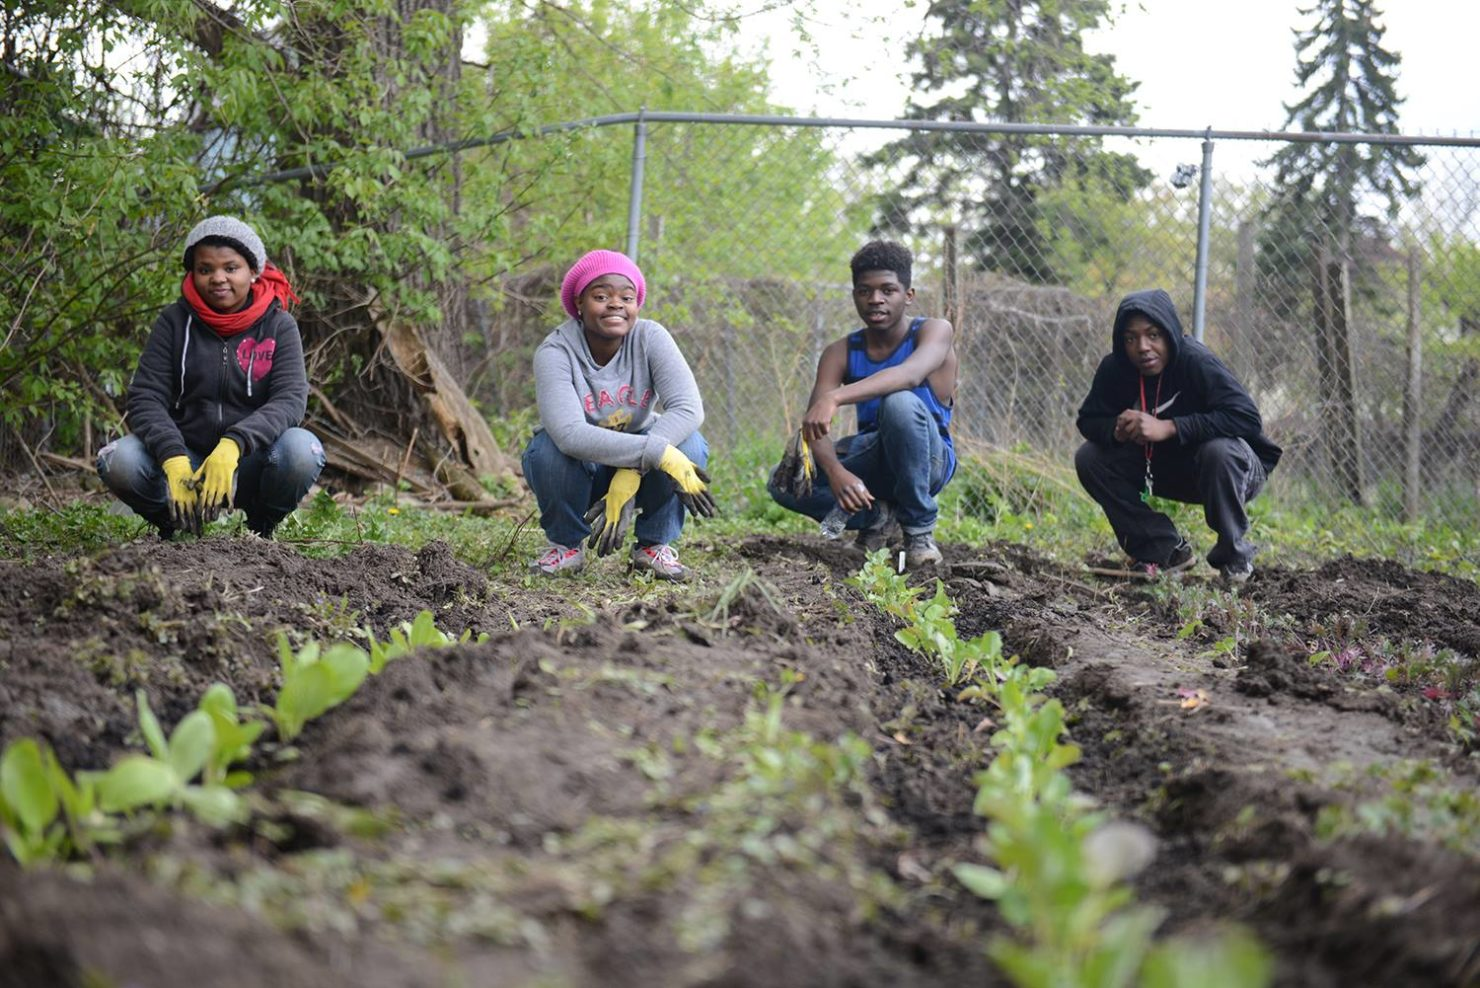 Teens grow greens